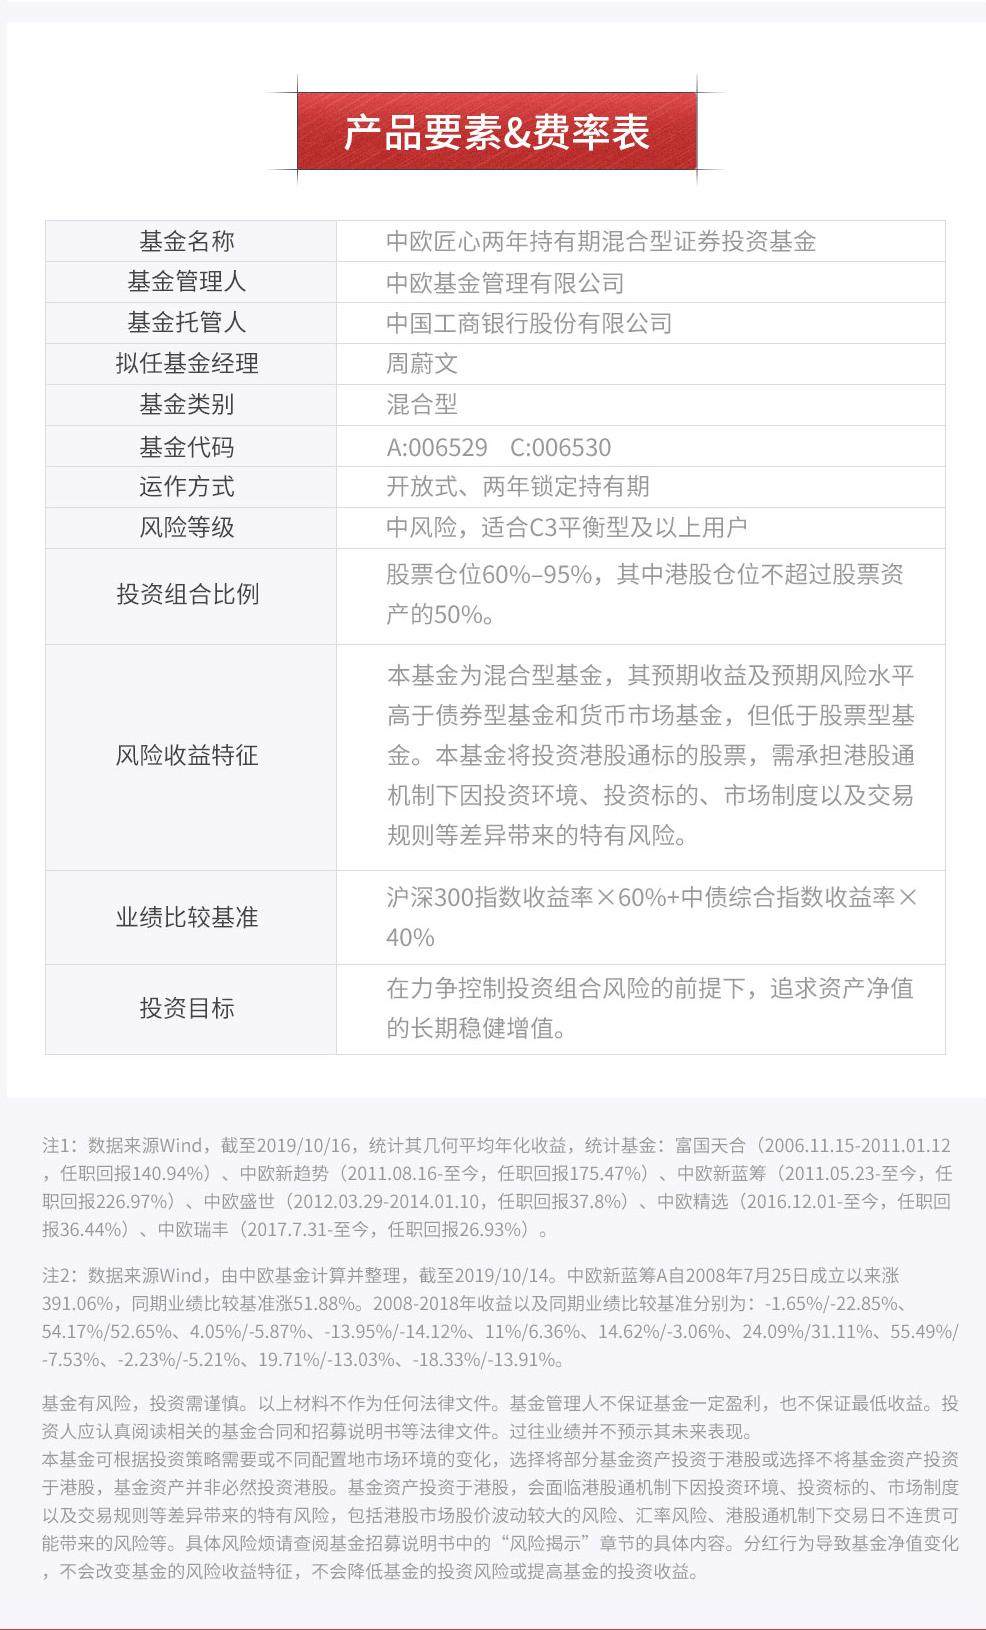 中欧匠心IPO专题-pc_07.png